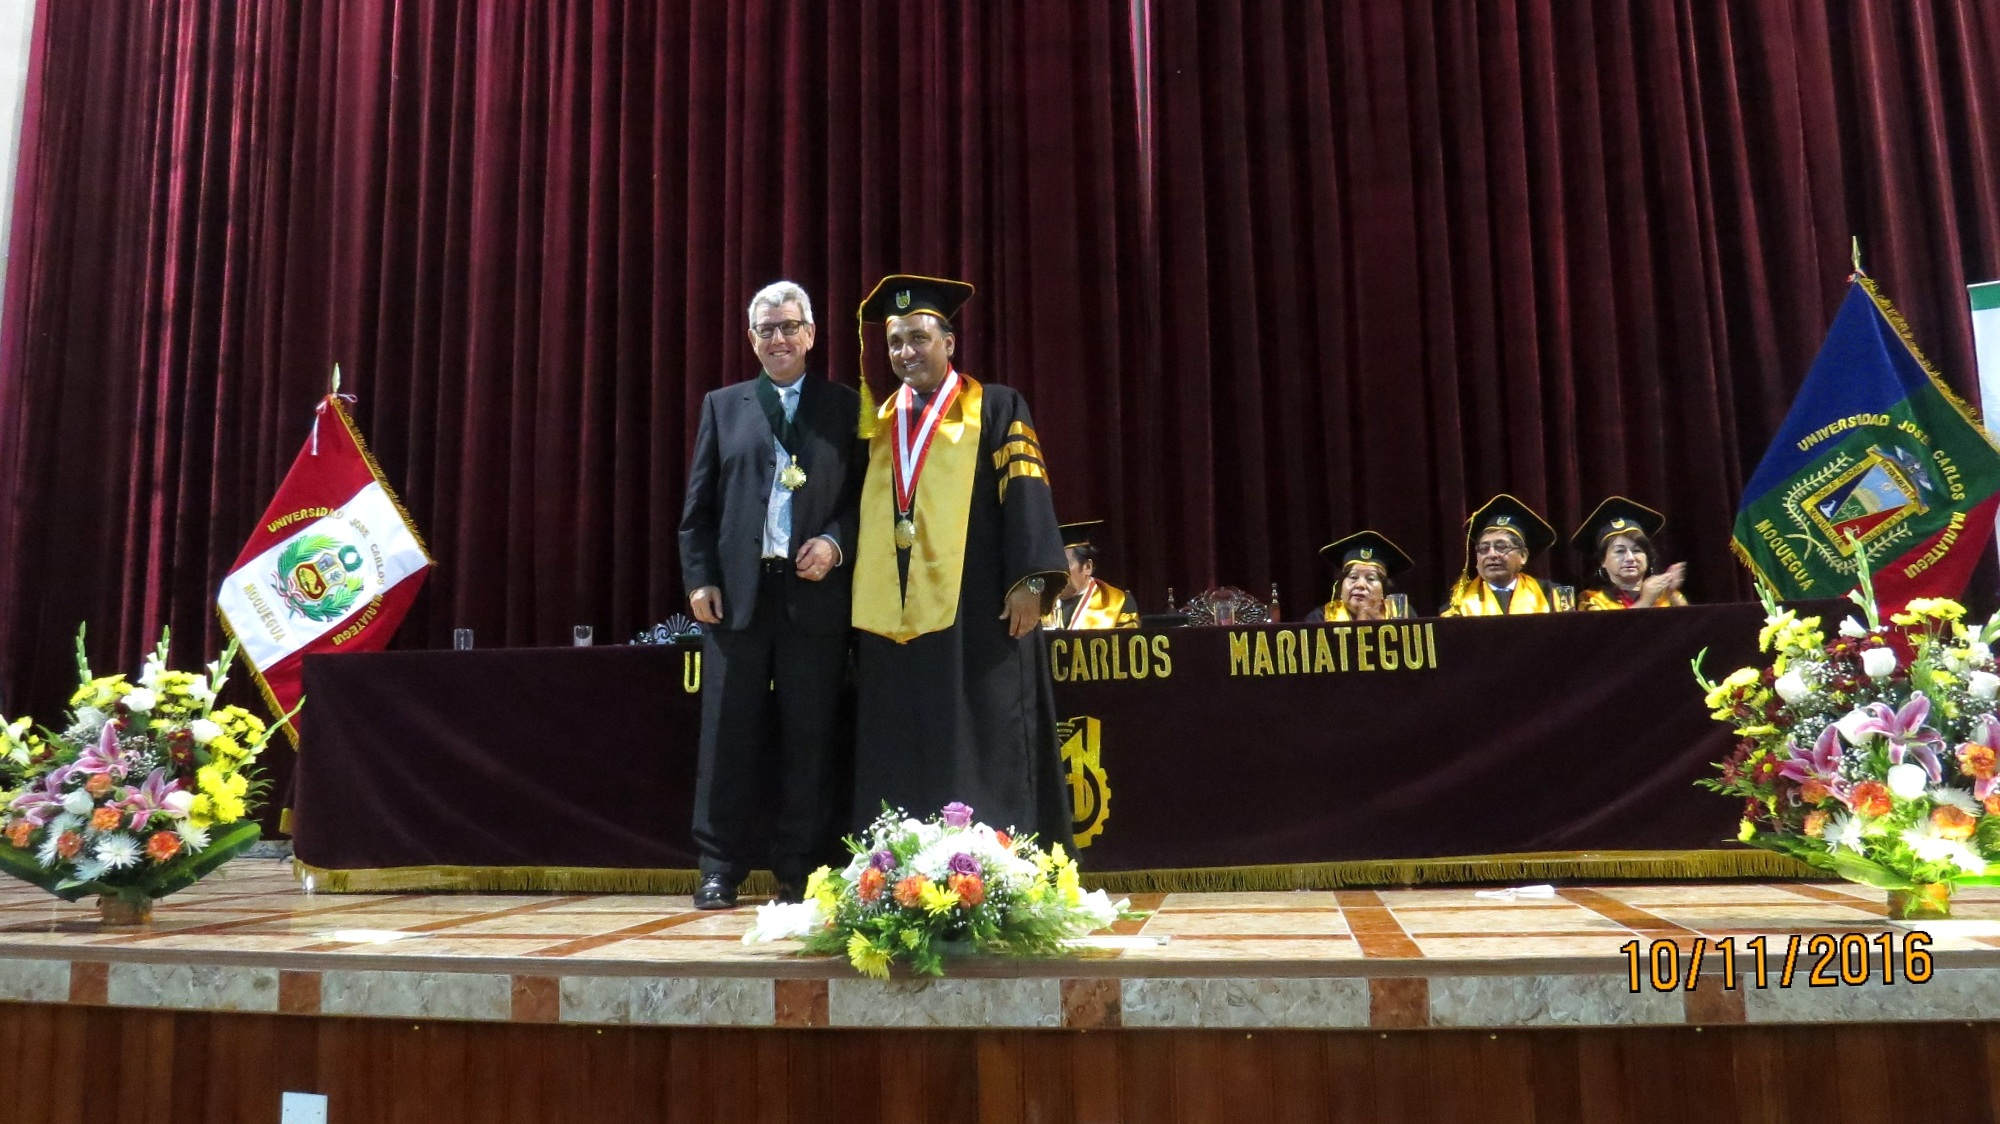 11-10-2016. Un momento de la investidura del Prof. Dr. Dr. h.c. de Vicente Remesal como Prof. Honorario